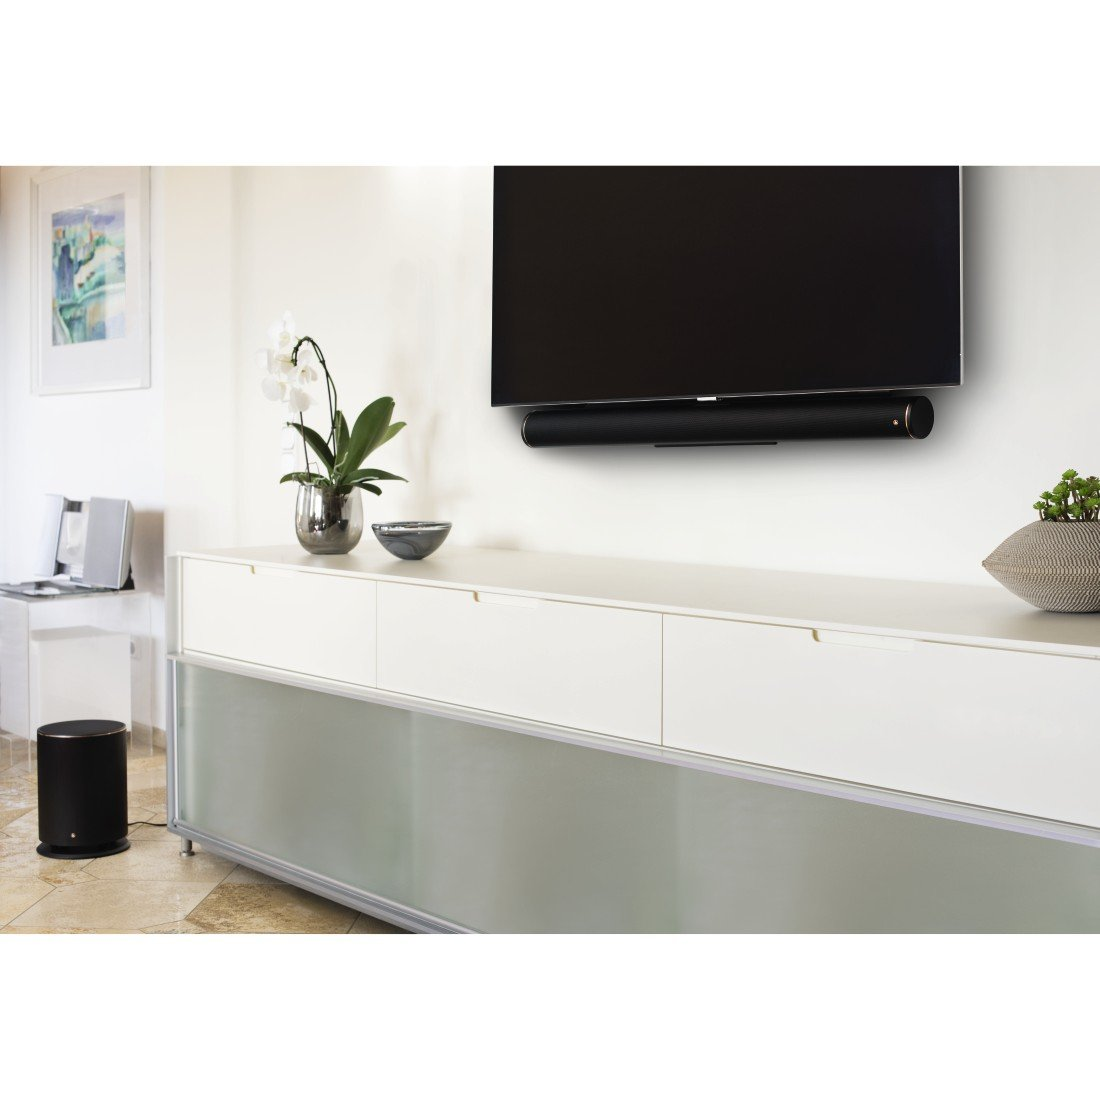 Hama TV-Soundbar-Halterung (universell für alle TV-Geräte ...